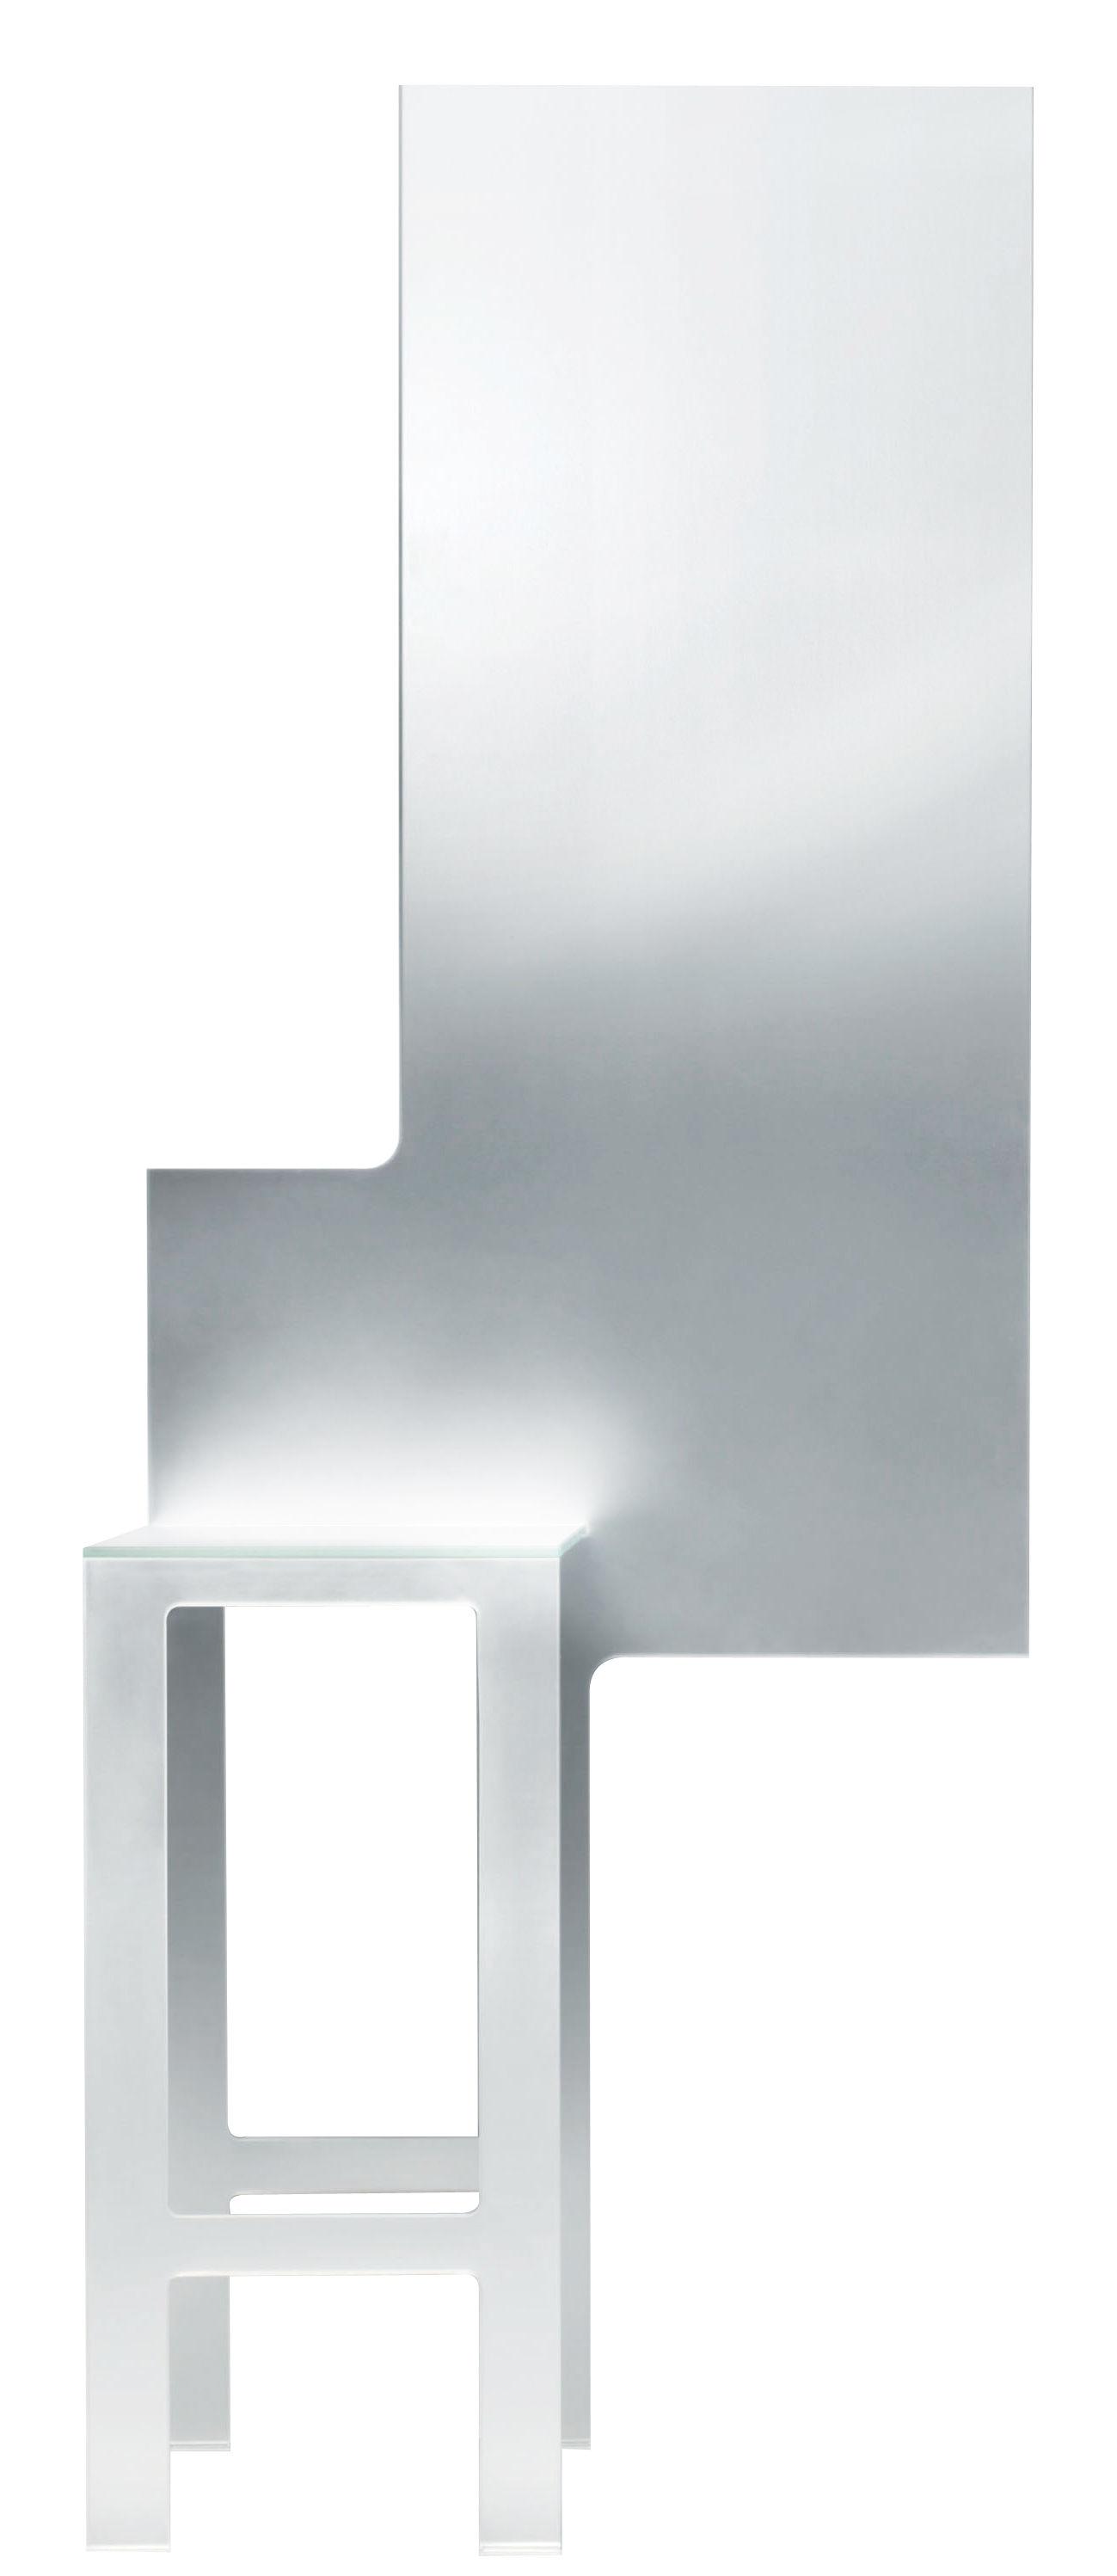 Mobilier - Miroirs - Miroir mural Mirror Stool / Assise intégrée H 75 cm - Glas Italia - Miroir / Métallisé - Cristal